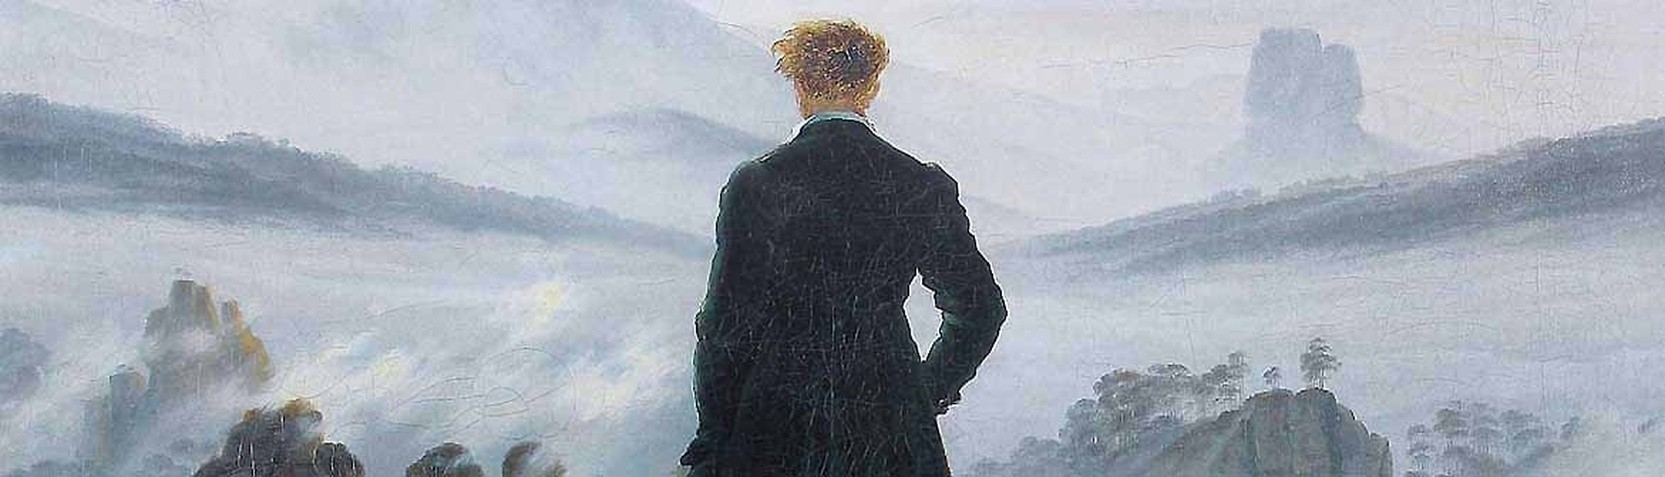 Artistes - Caspar David Friedrich